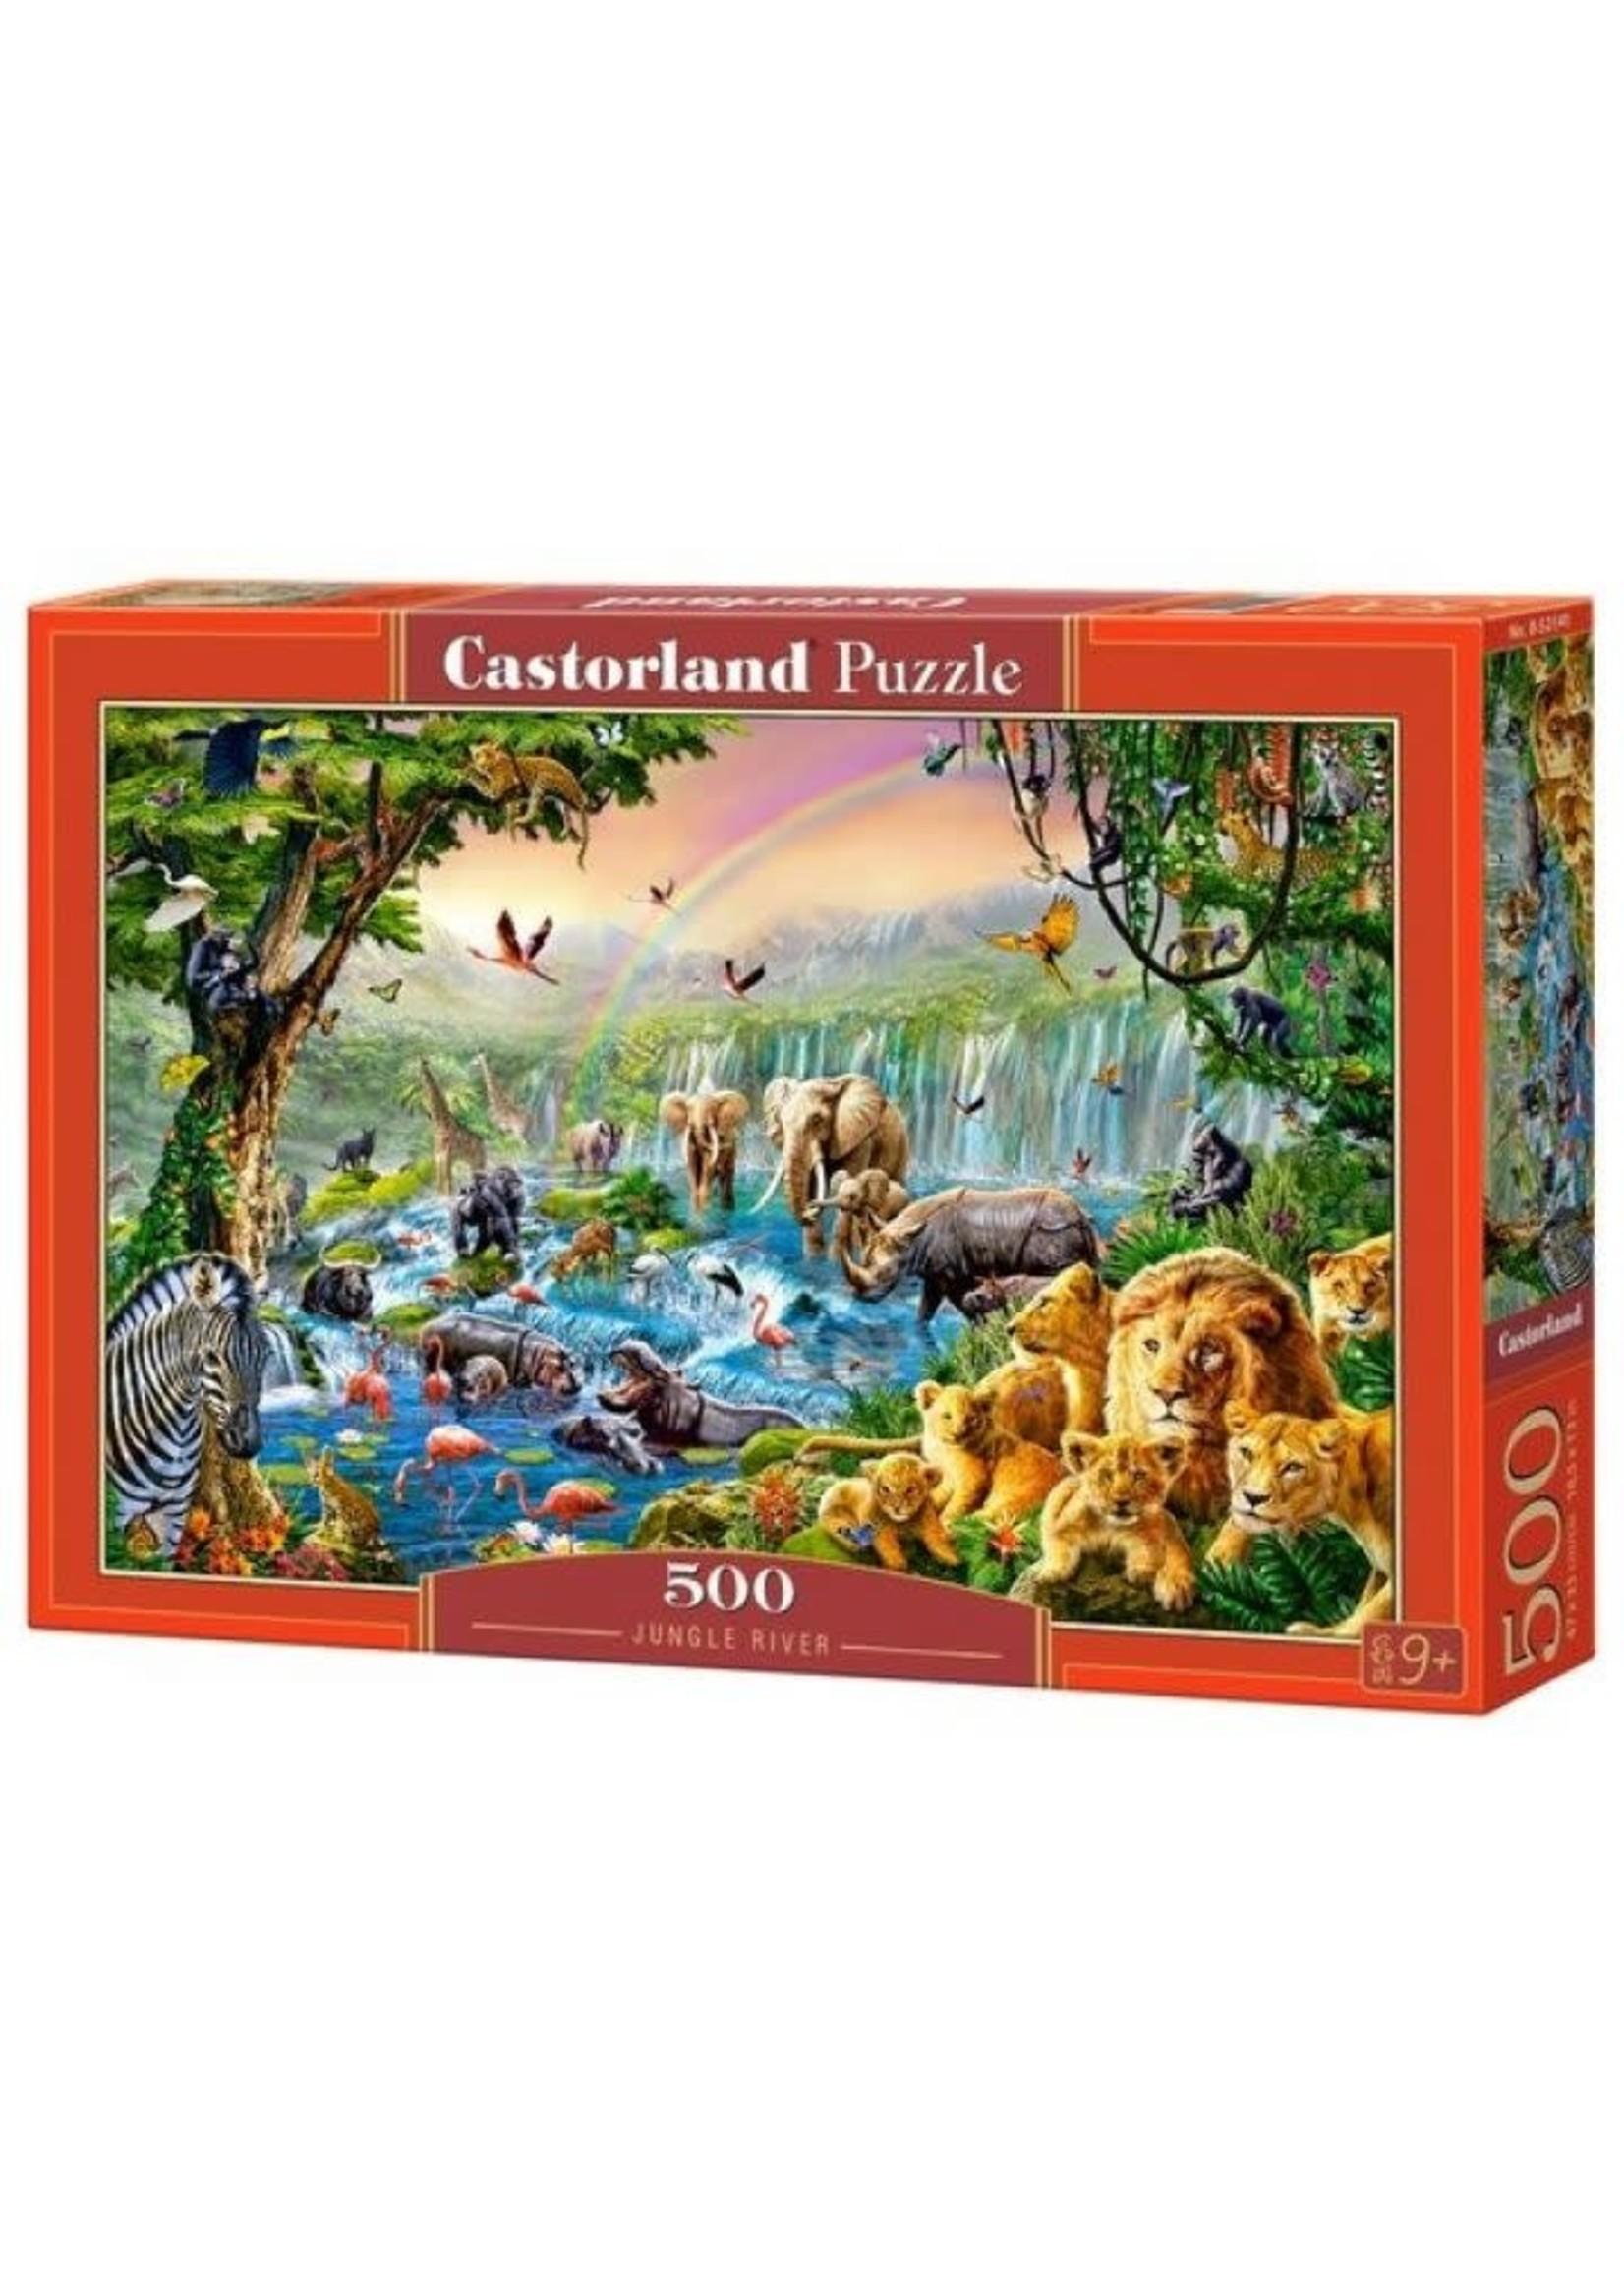 Castorland Jungle River (500 Pcs.)